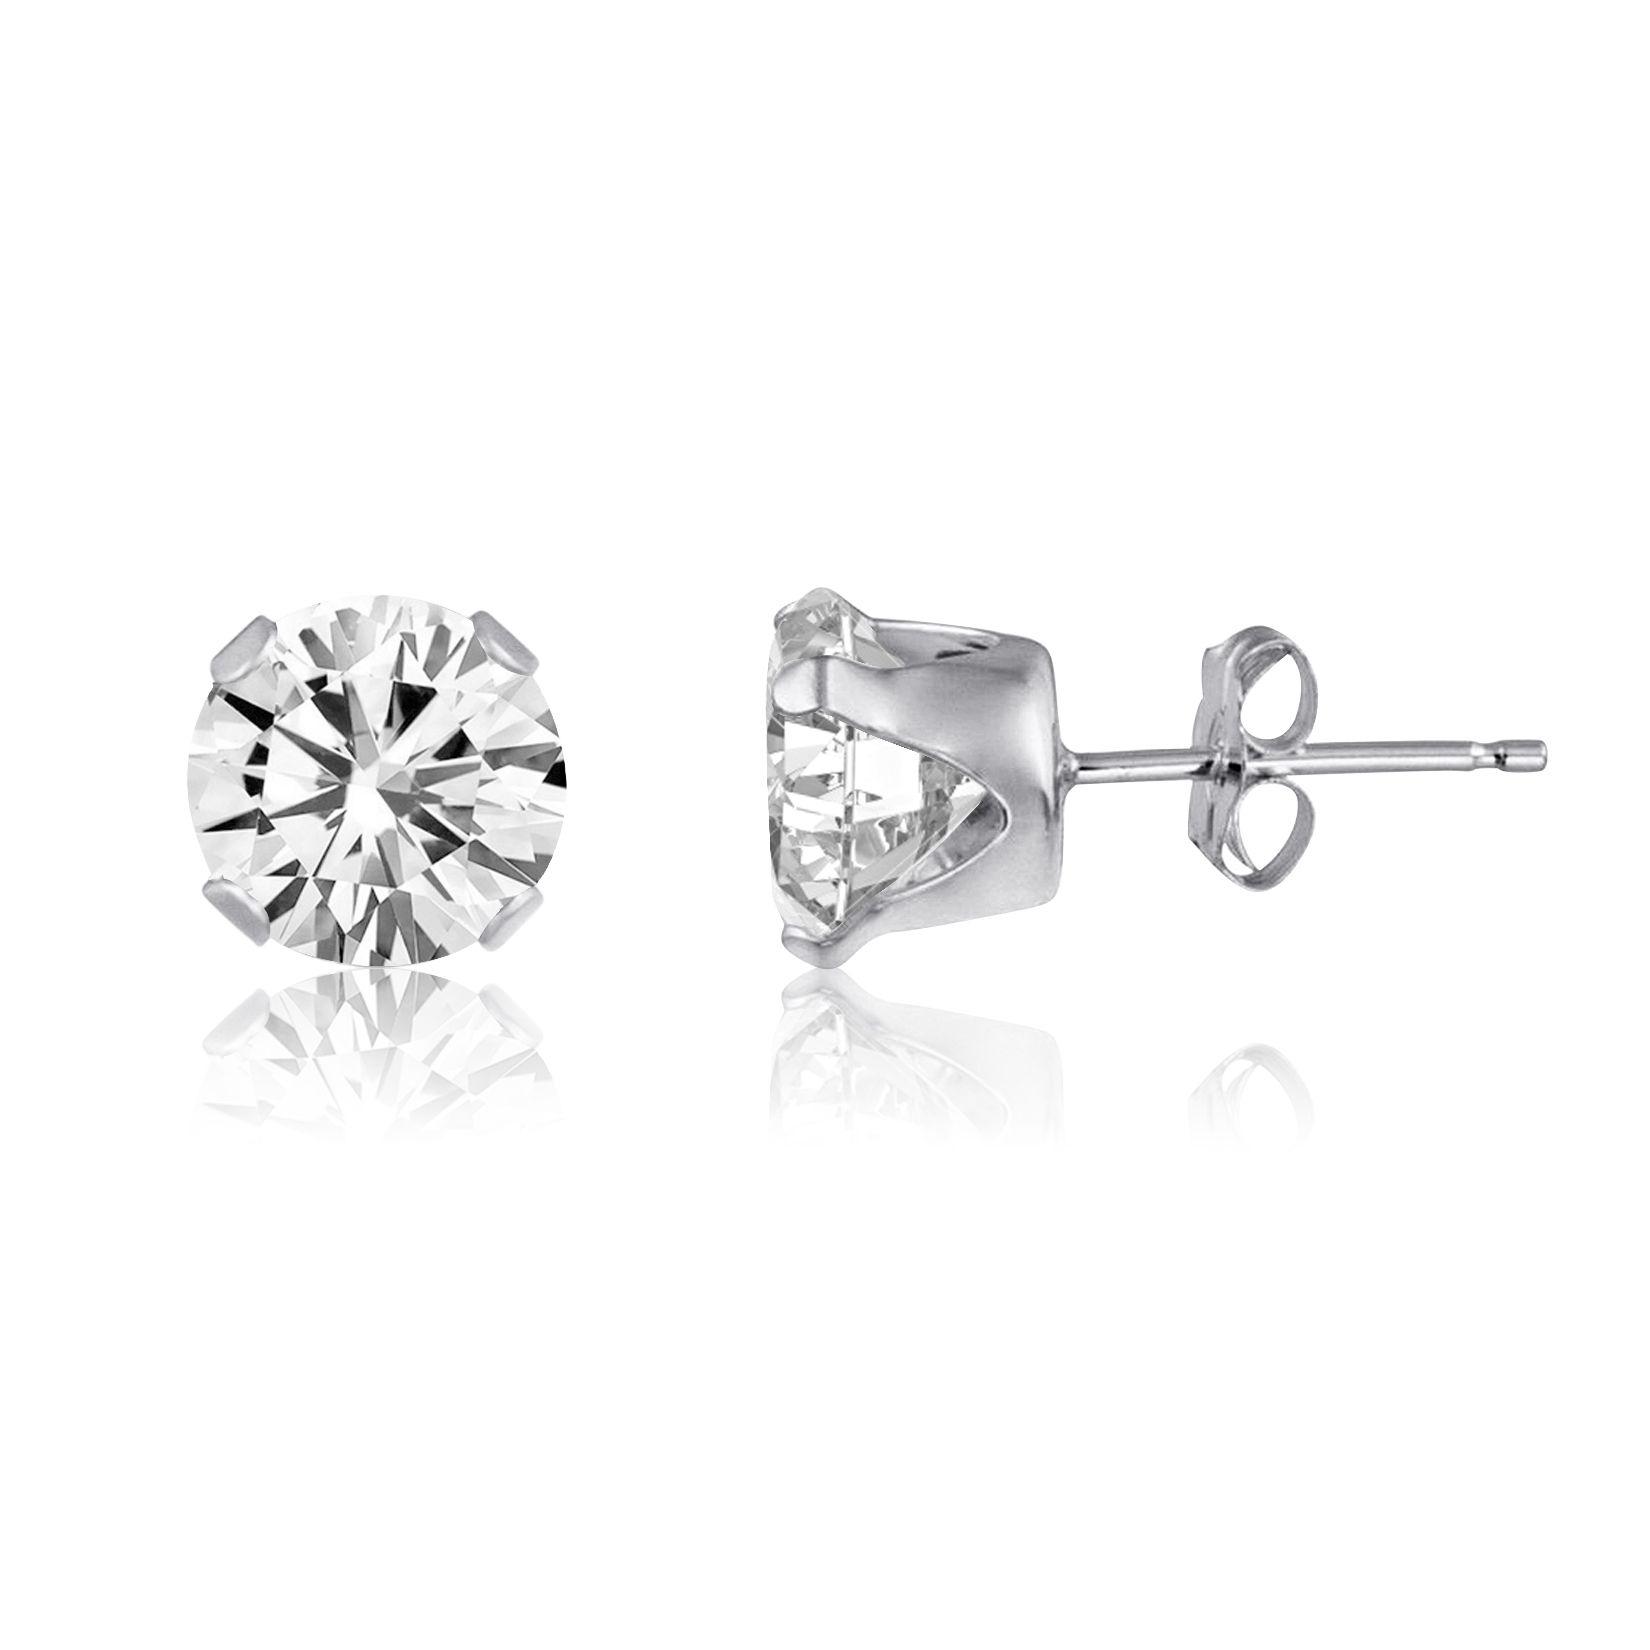 2ct White Topaz 925 Sterling Silver Stud Earrings